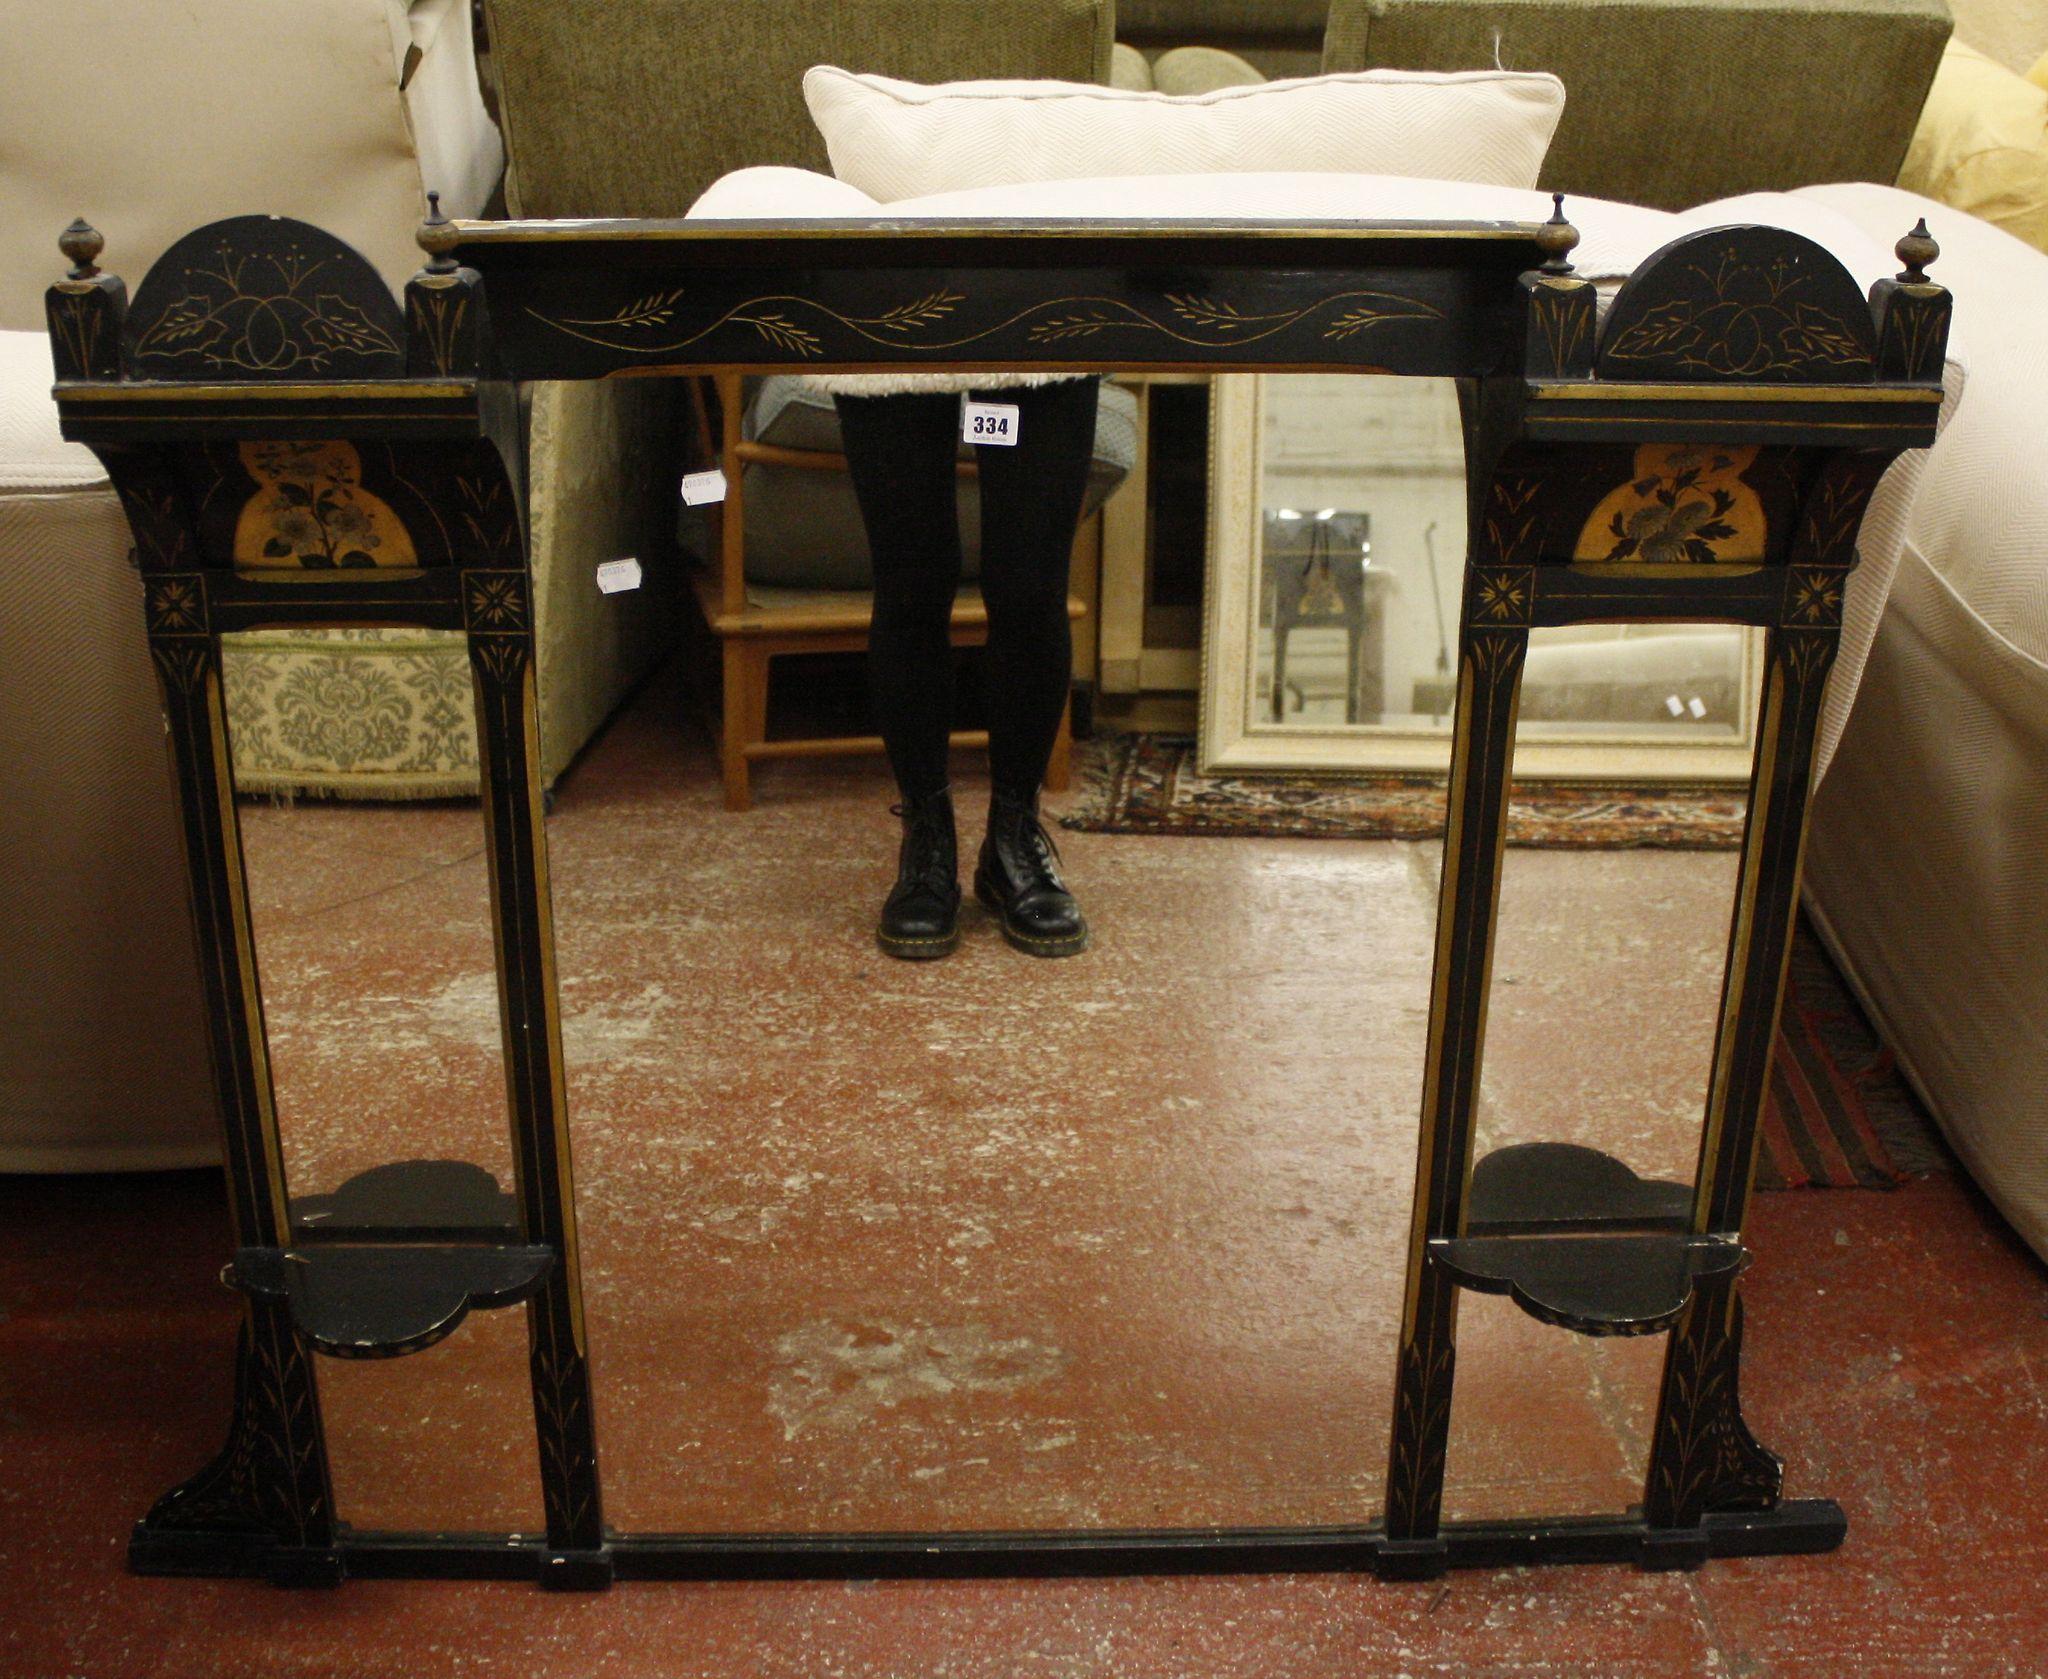 An ebonised overmantel Aesthetic mirror